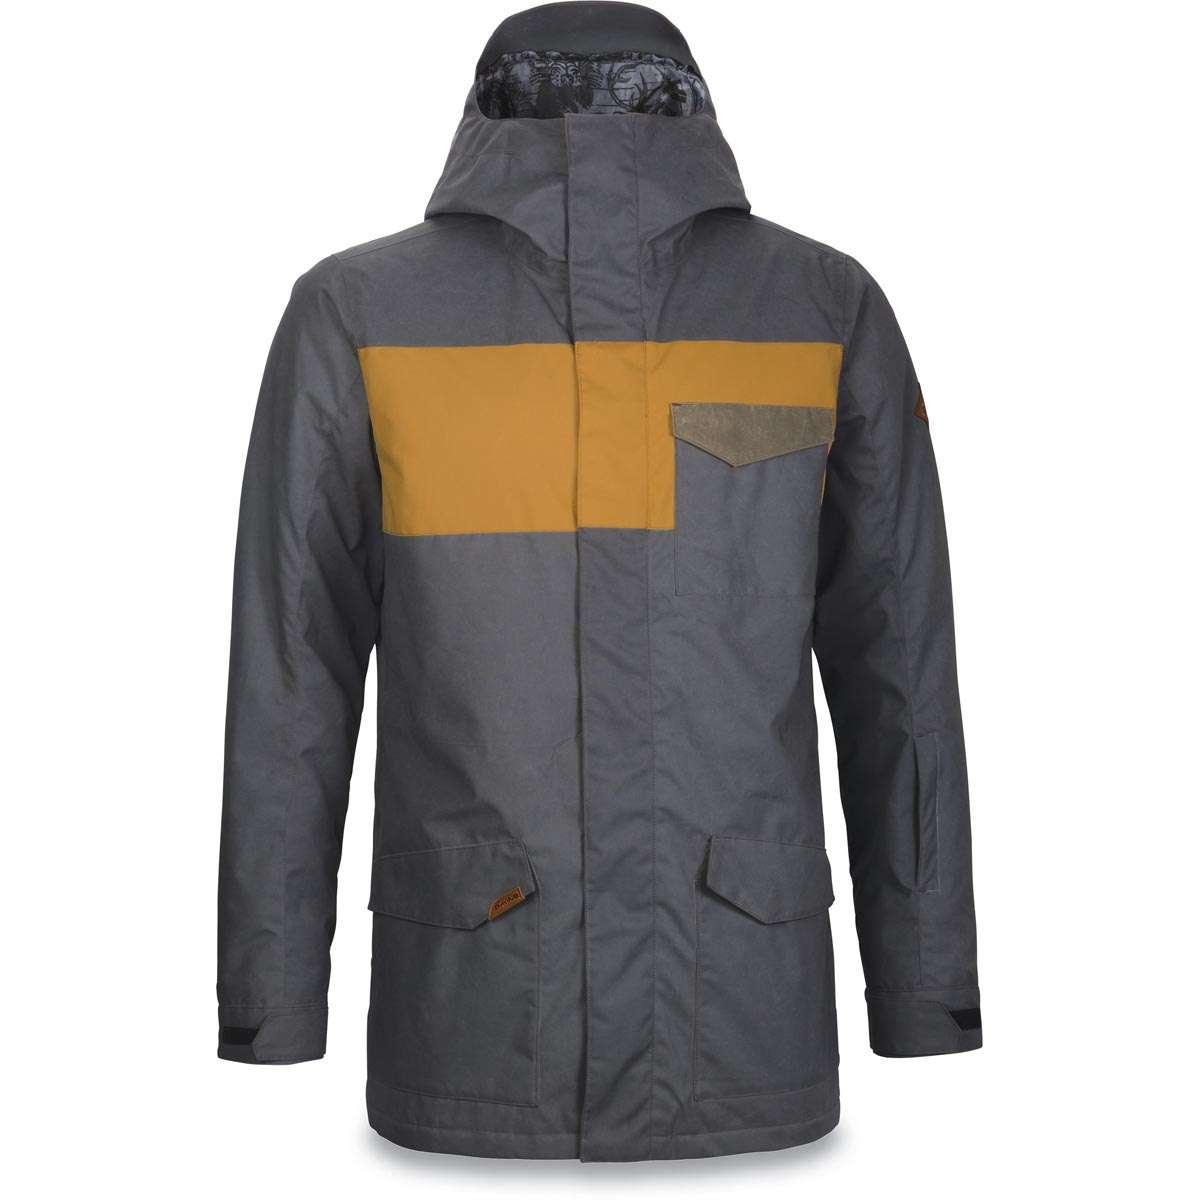 Tarmac Veste Elsman Ski Jacket Black Buckskin Snow Dakine 0q0wrFTA